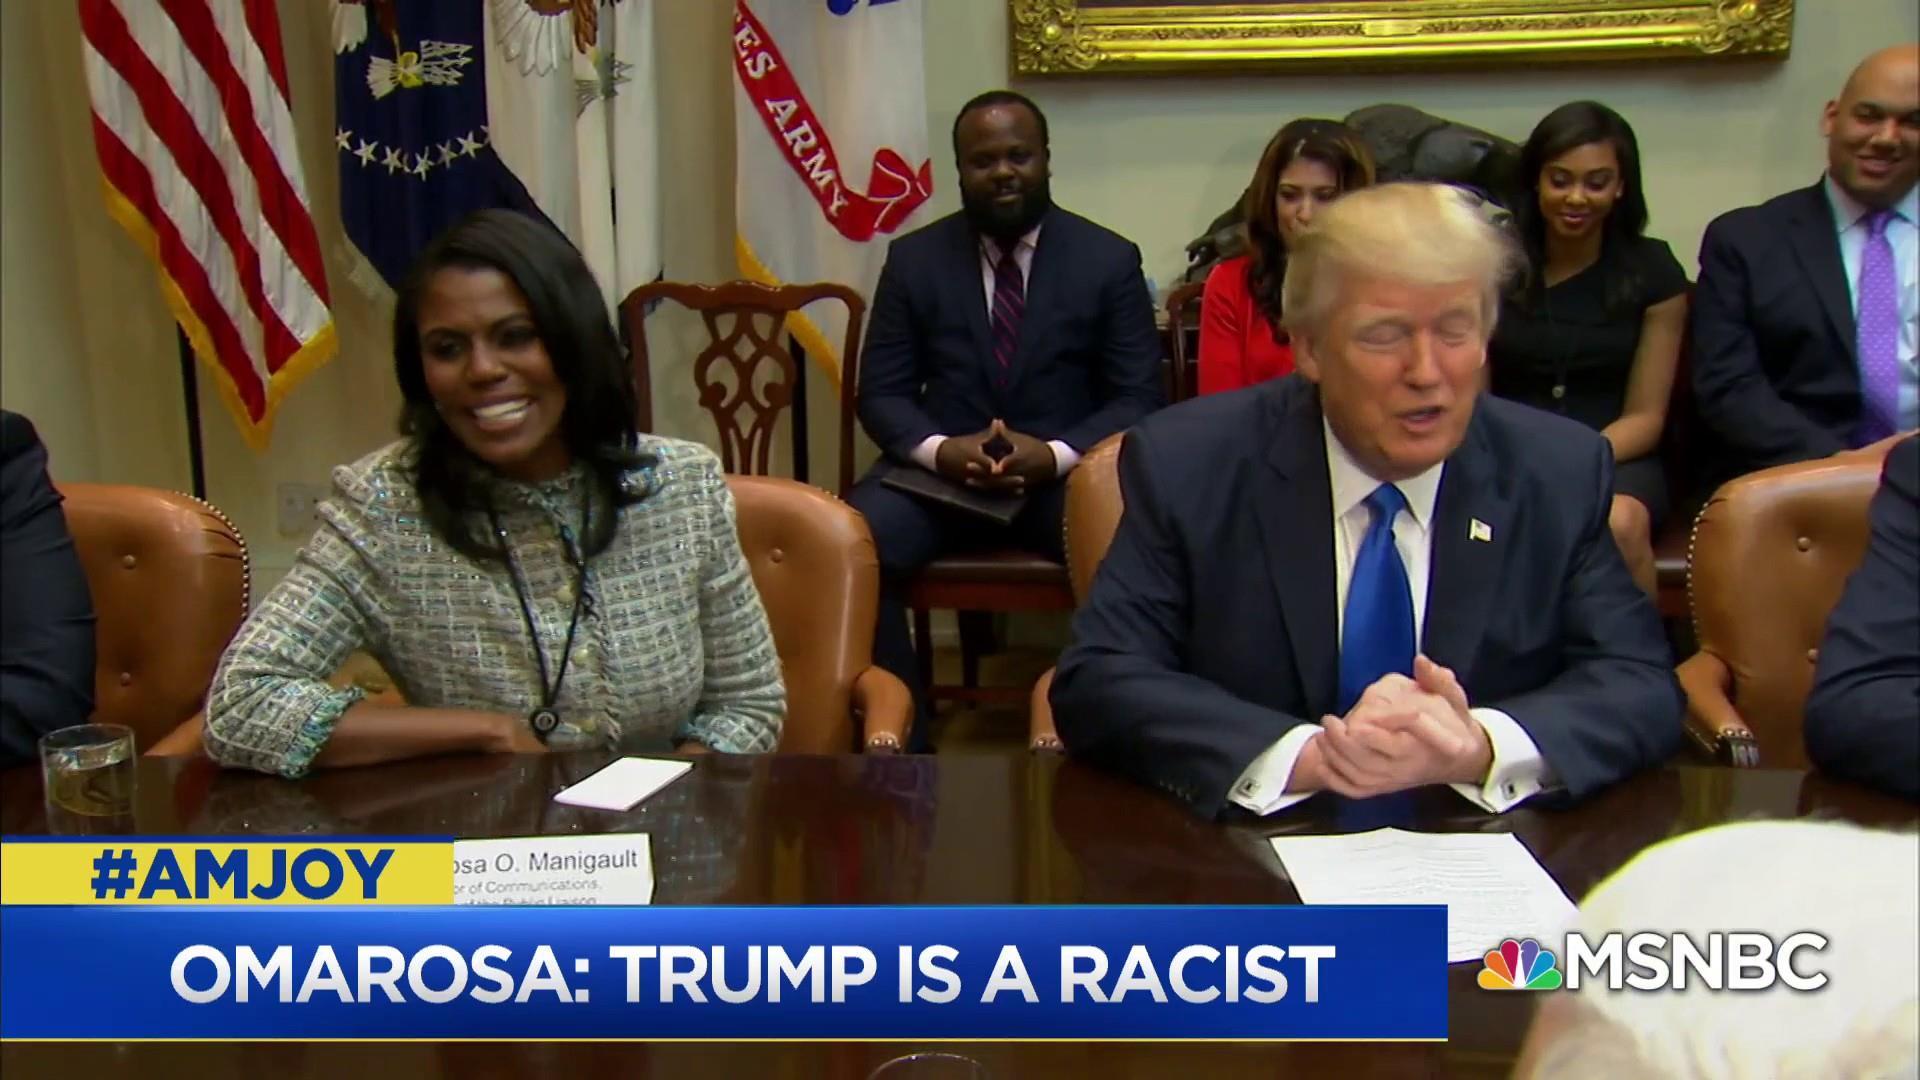 Should Omarosa have left the White House sooner?